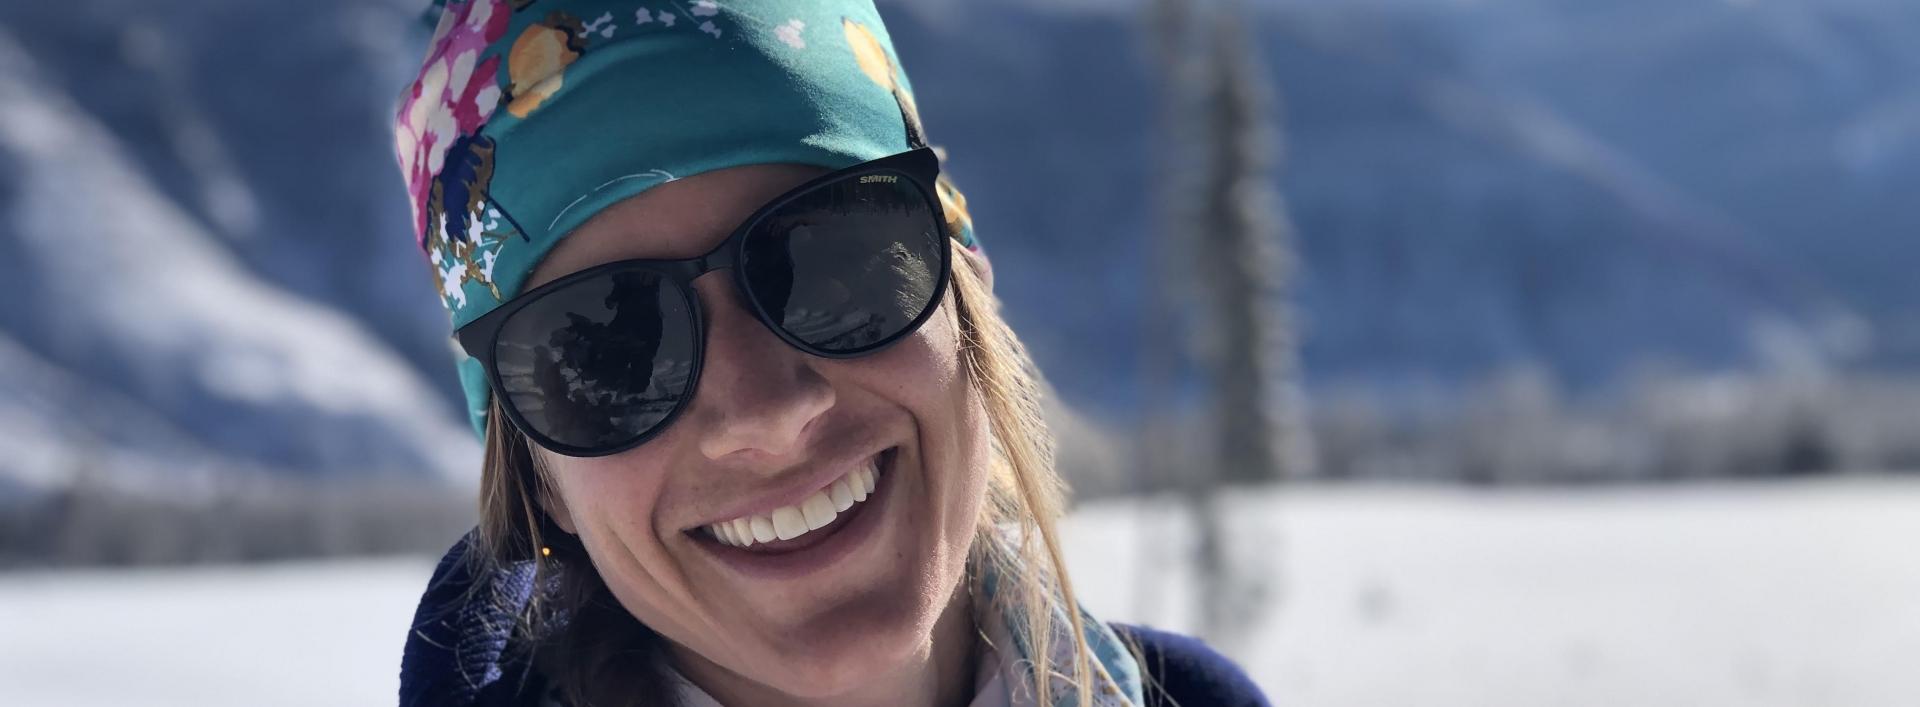 Smiling woman in sunglasses in snowy terrain